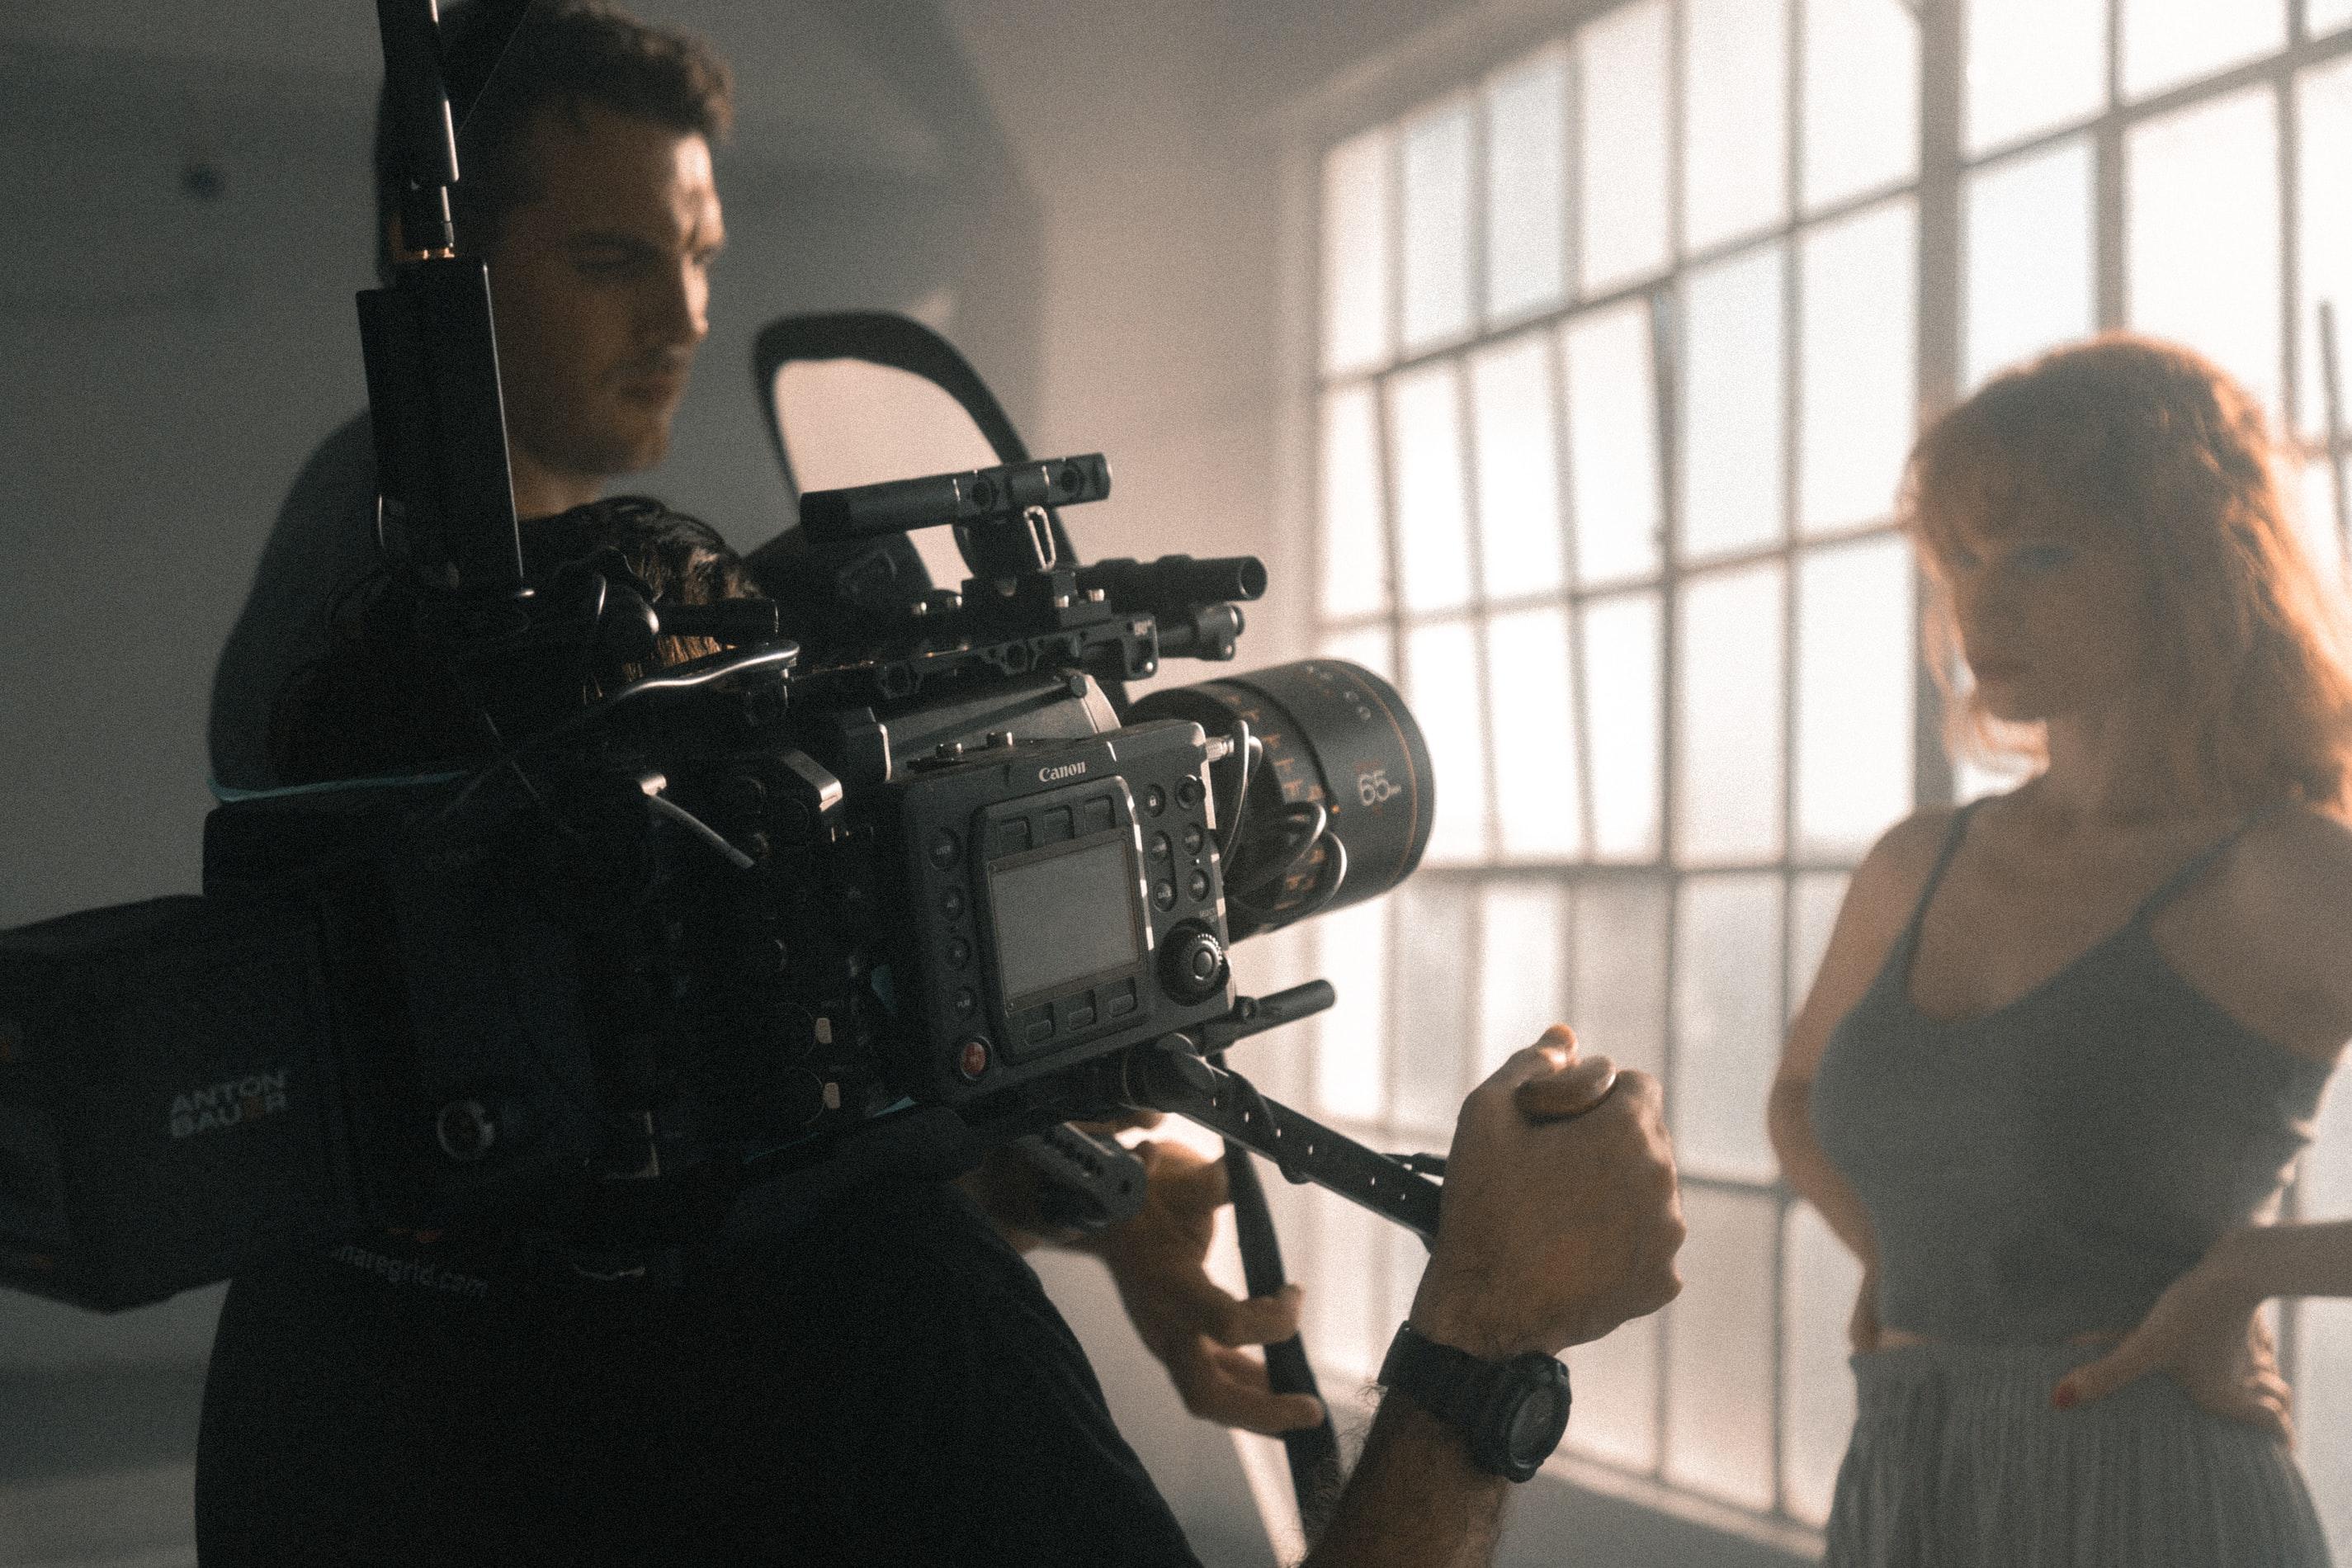 Sarah Clark shares tips for casting